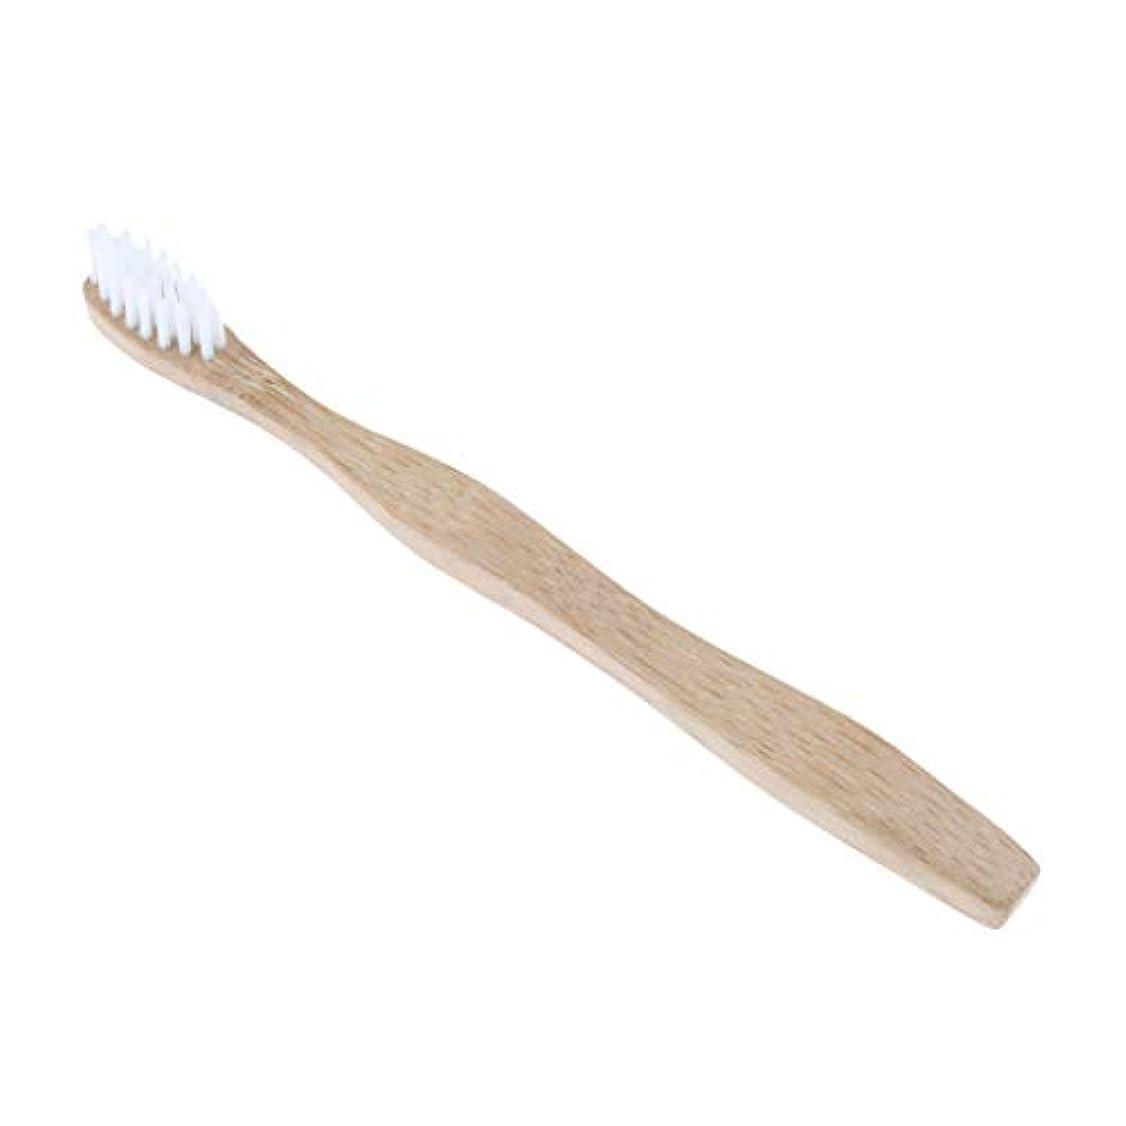 sharprepublic キッズ ハブラシ 歯ブラシ ソフト ブリストル 木製ハンドル 歯ブラシ 歯ケア 全4色 - 白